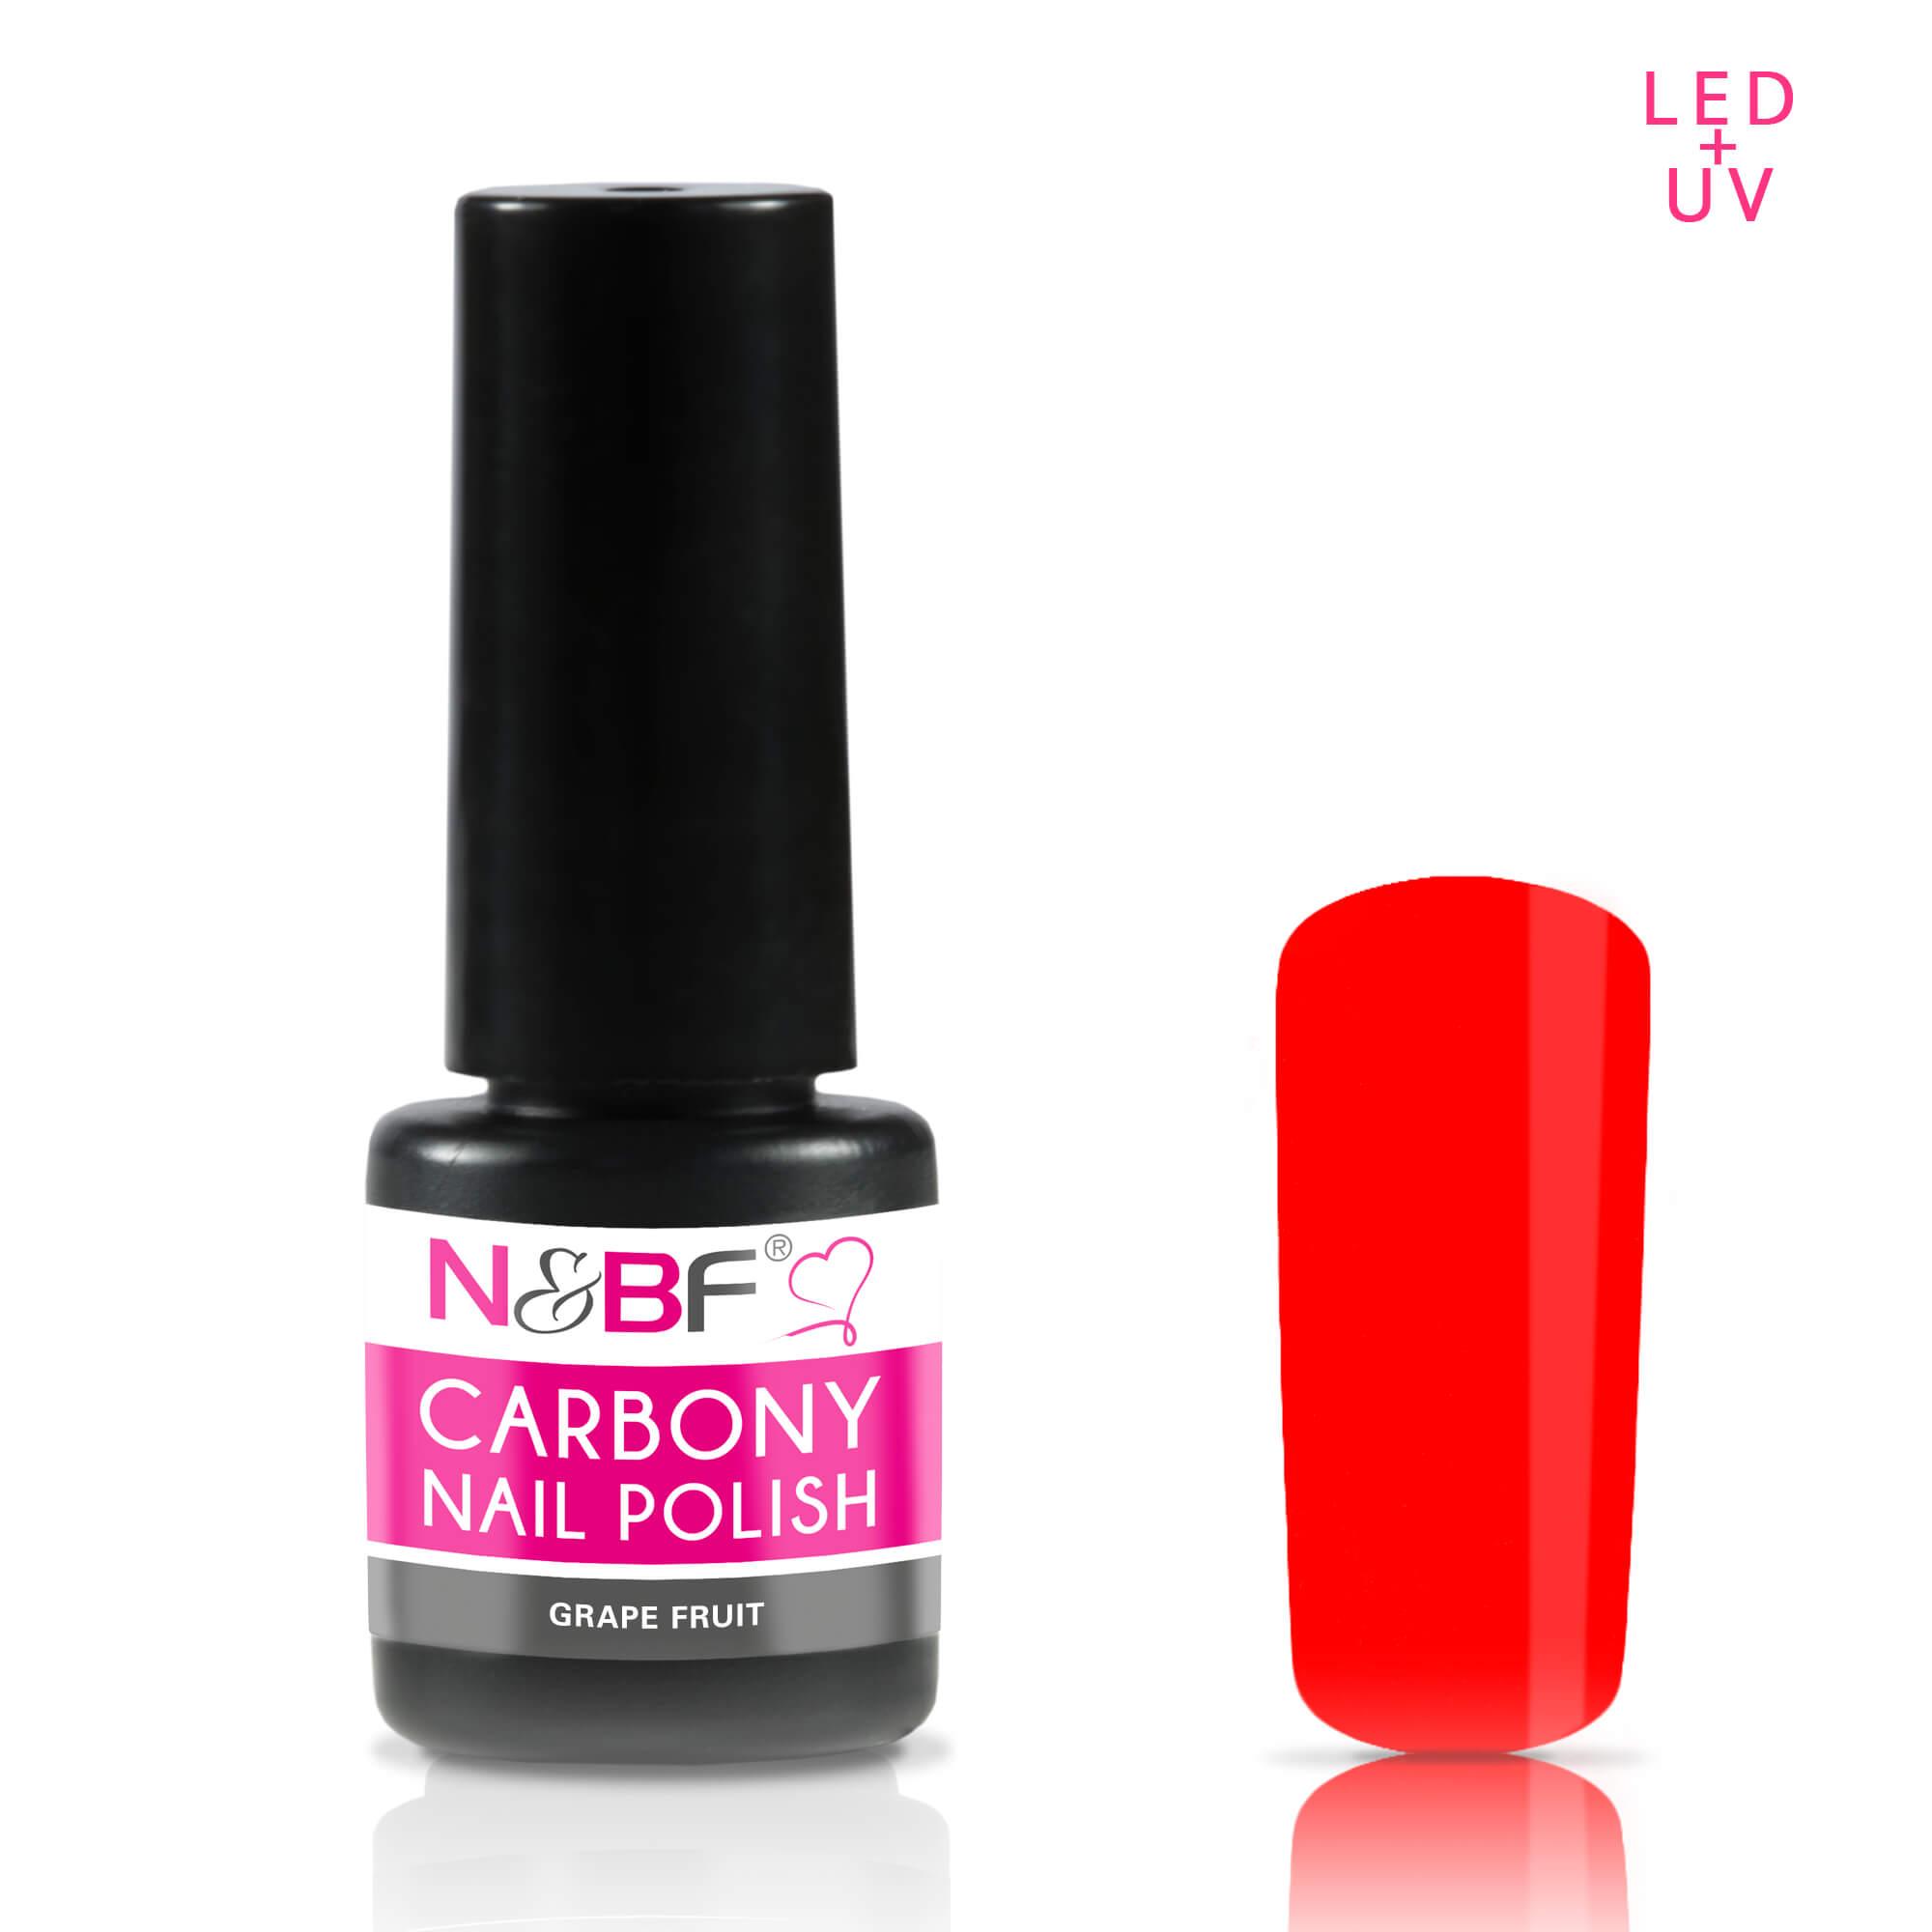 uv led nagellack carbony 3 in 1 nagel gel polish 5ml d nnviskos versch rot t ne ebay. Black Bedroom Furniture Sets. Home Design Ideas